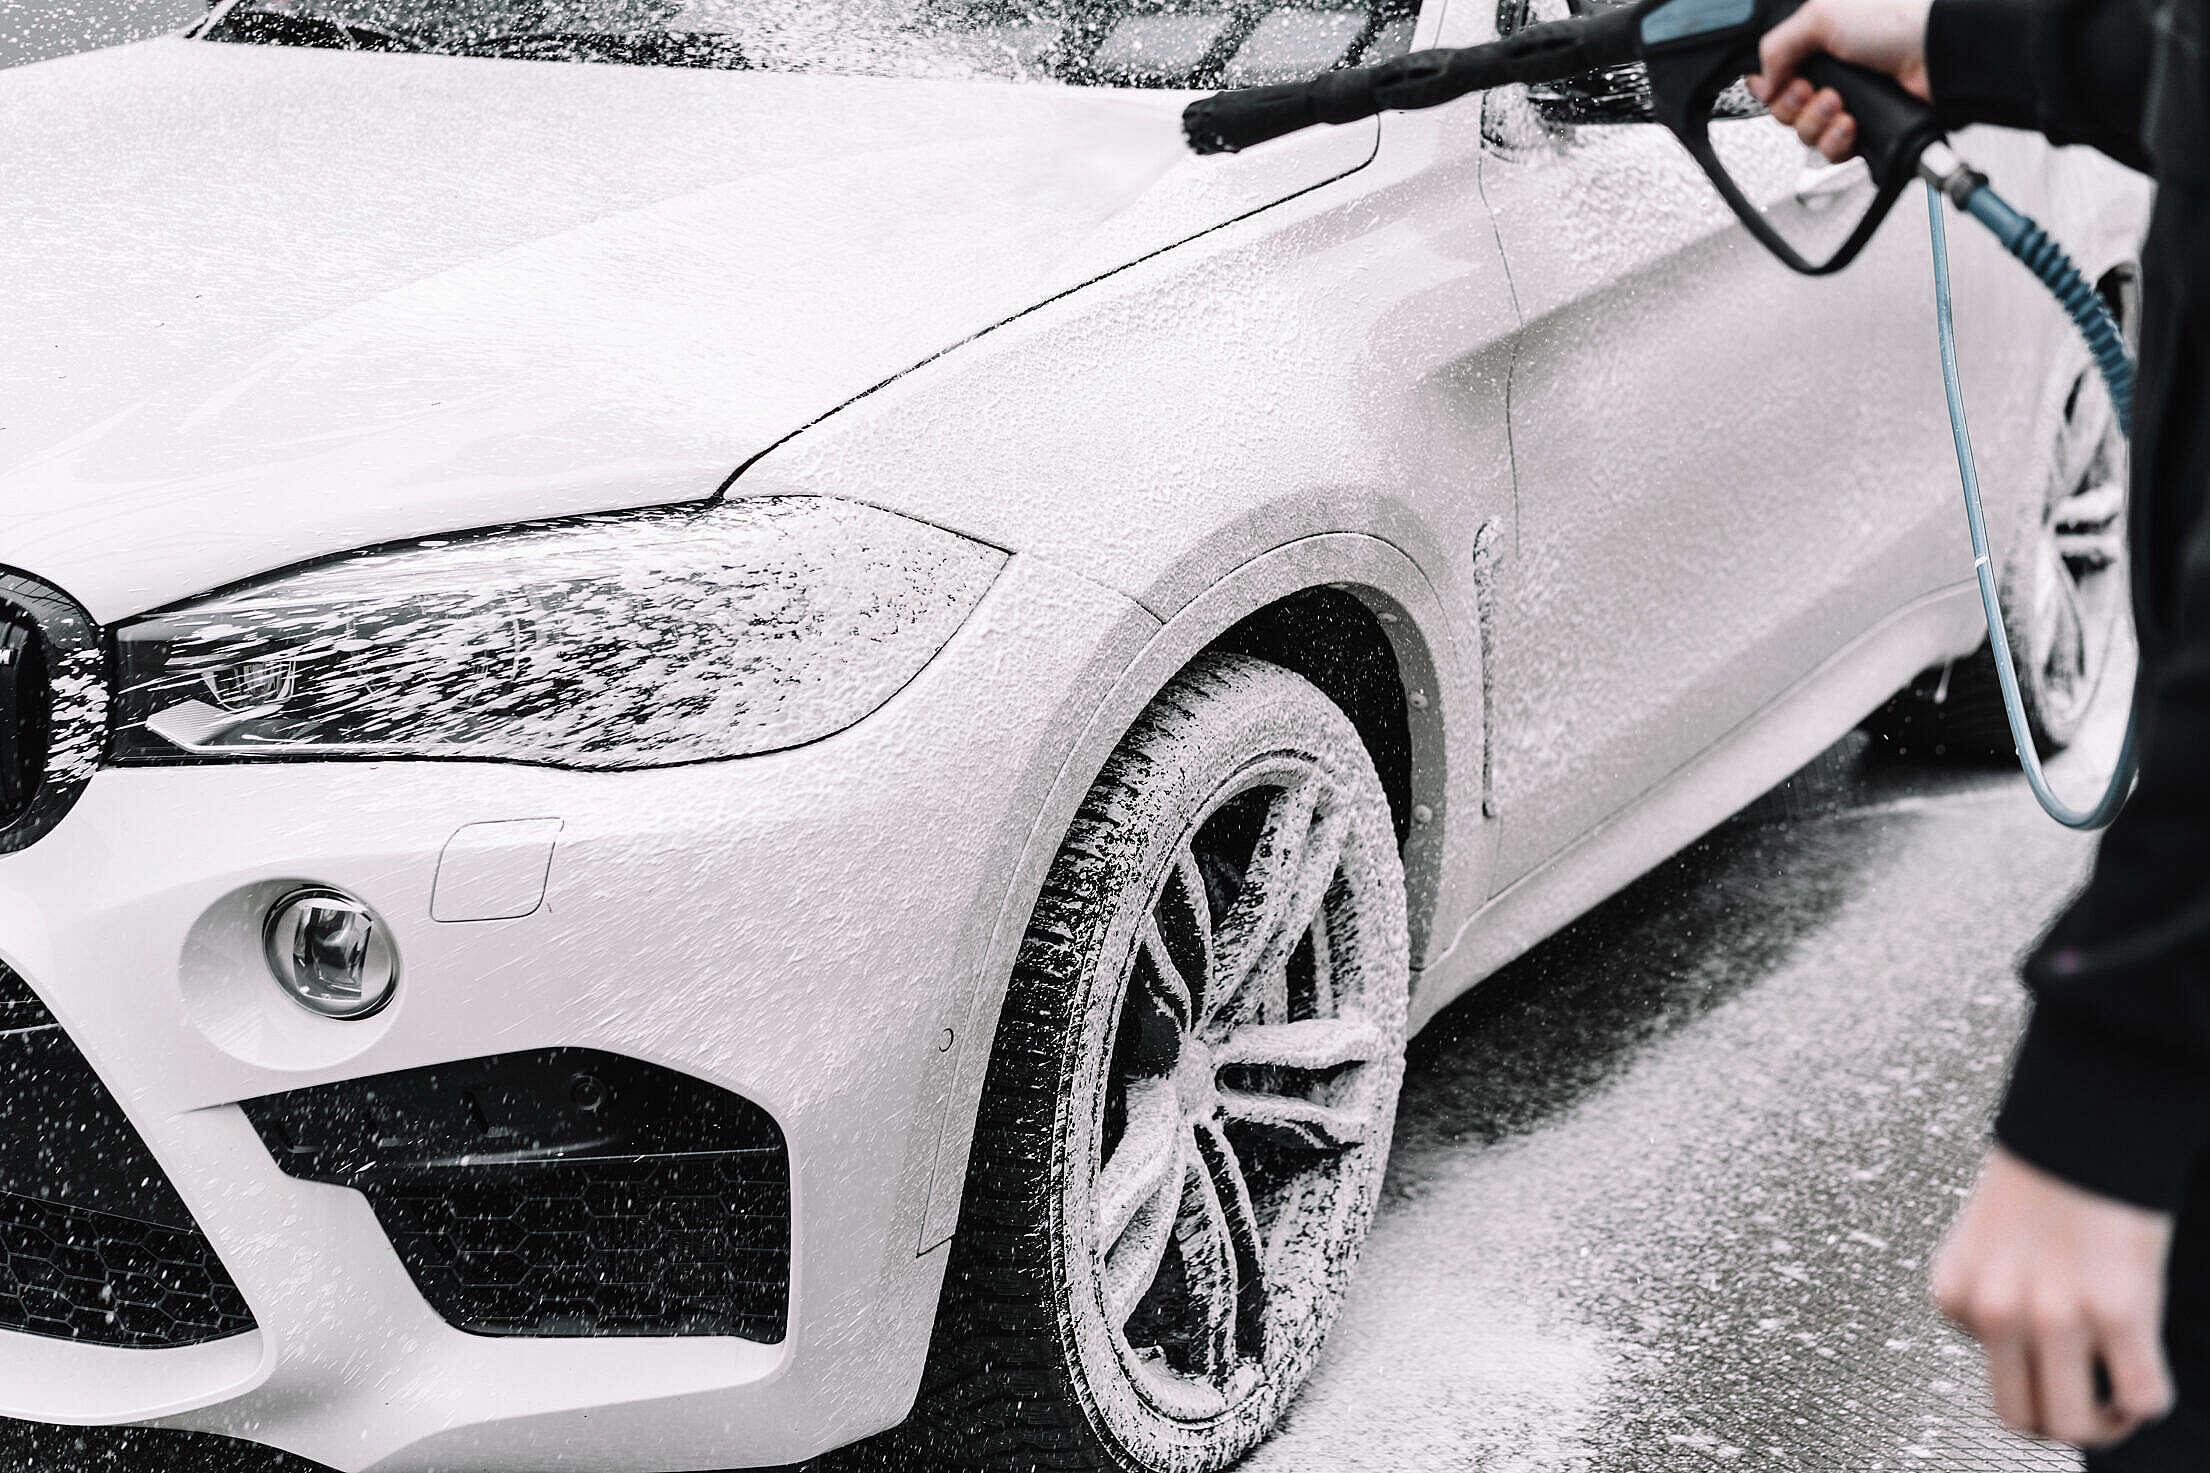 Active Foam Self Service Carwash Free Stock Photo